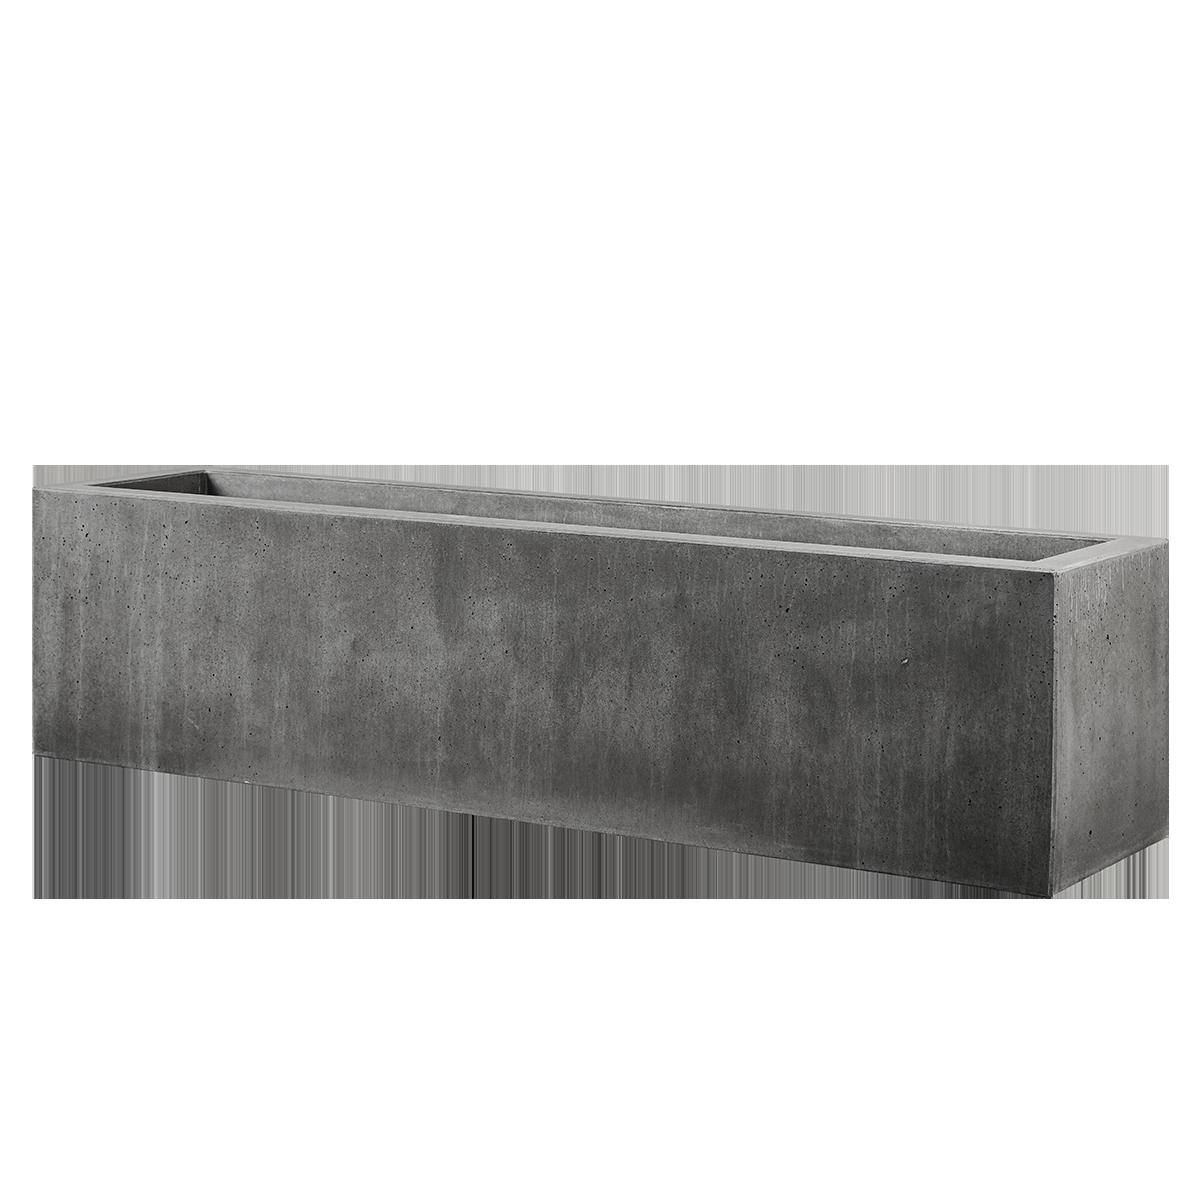 Plantekummer Nordicserien 200x50x50 cm Sort/Antracit m/bund